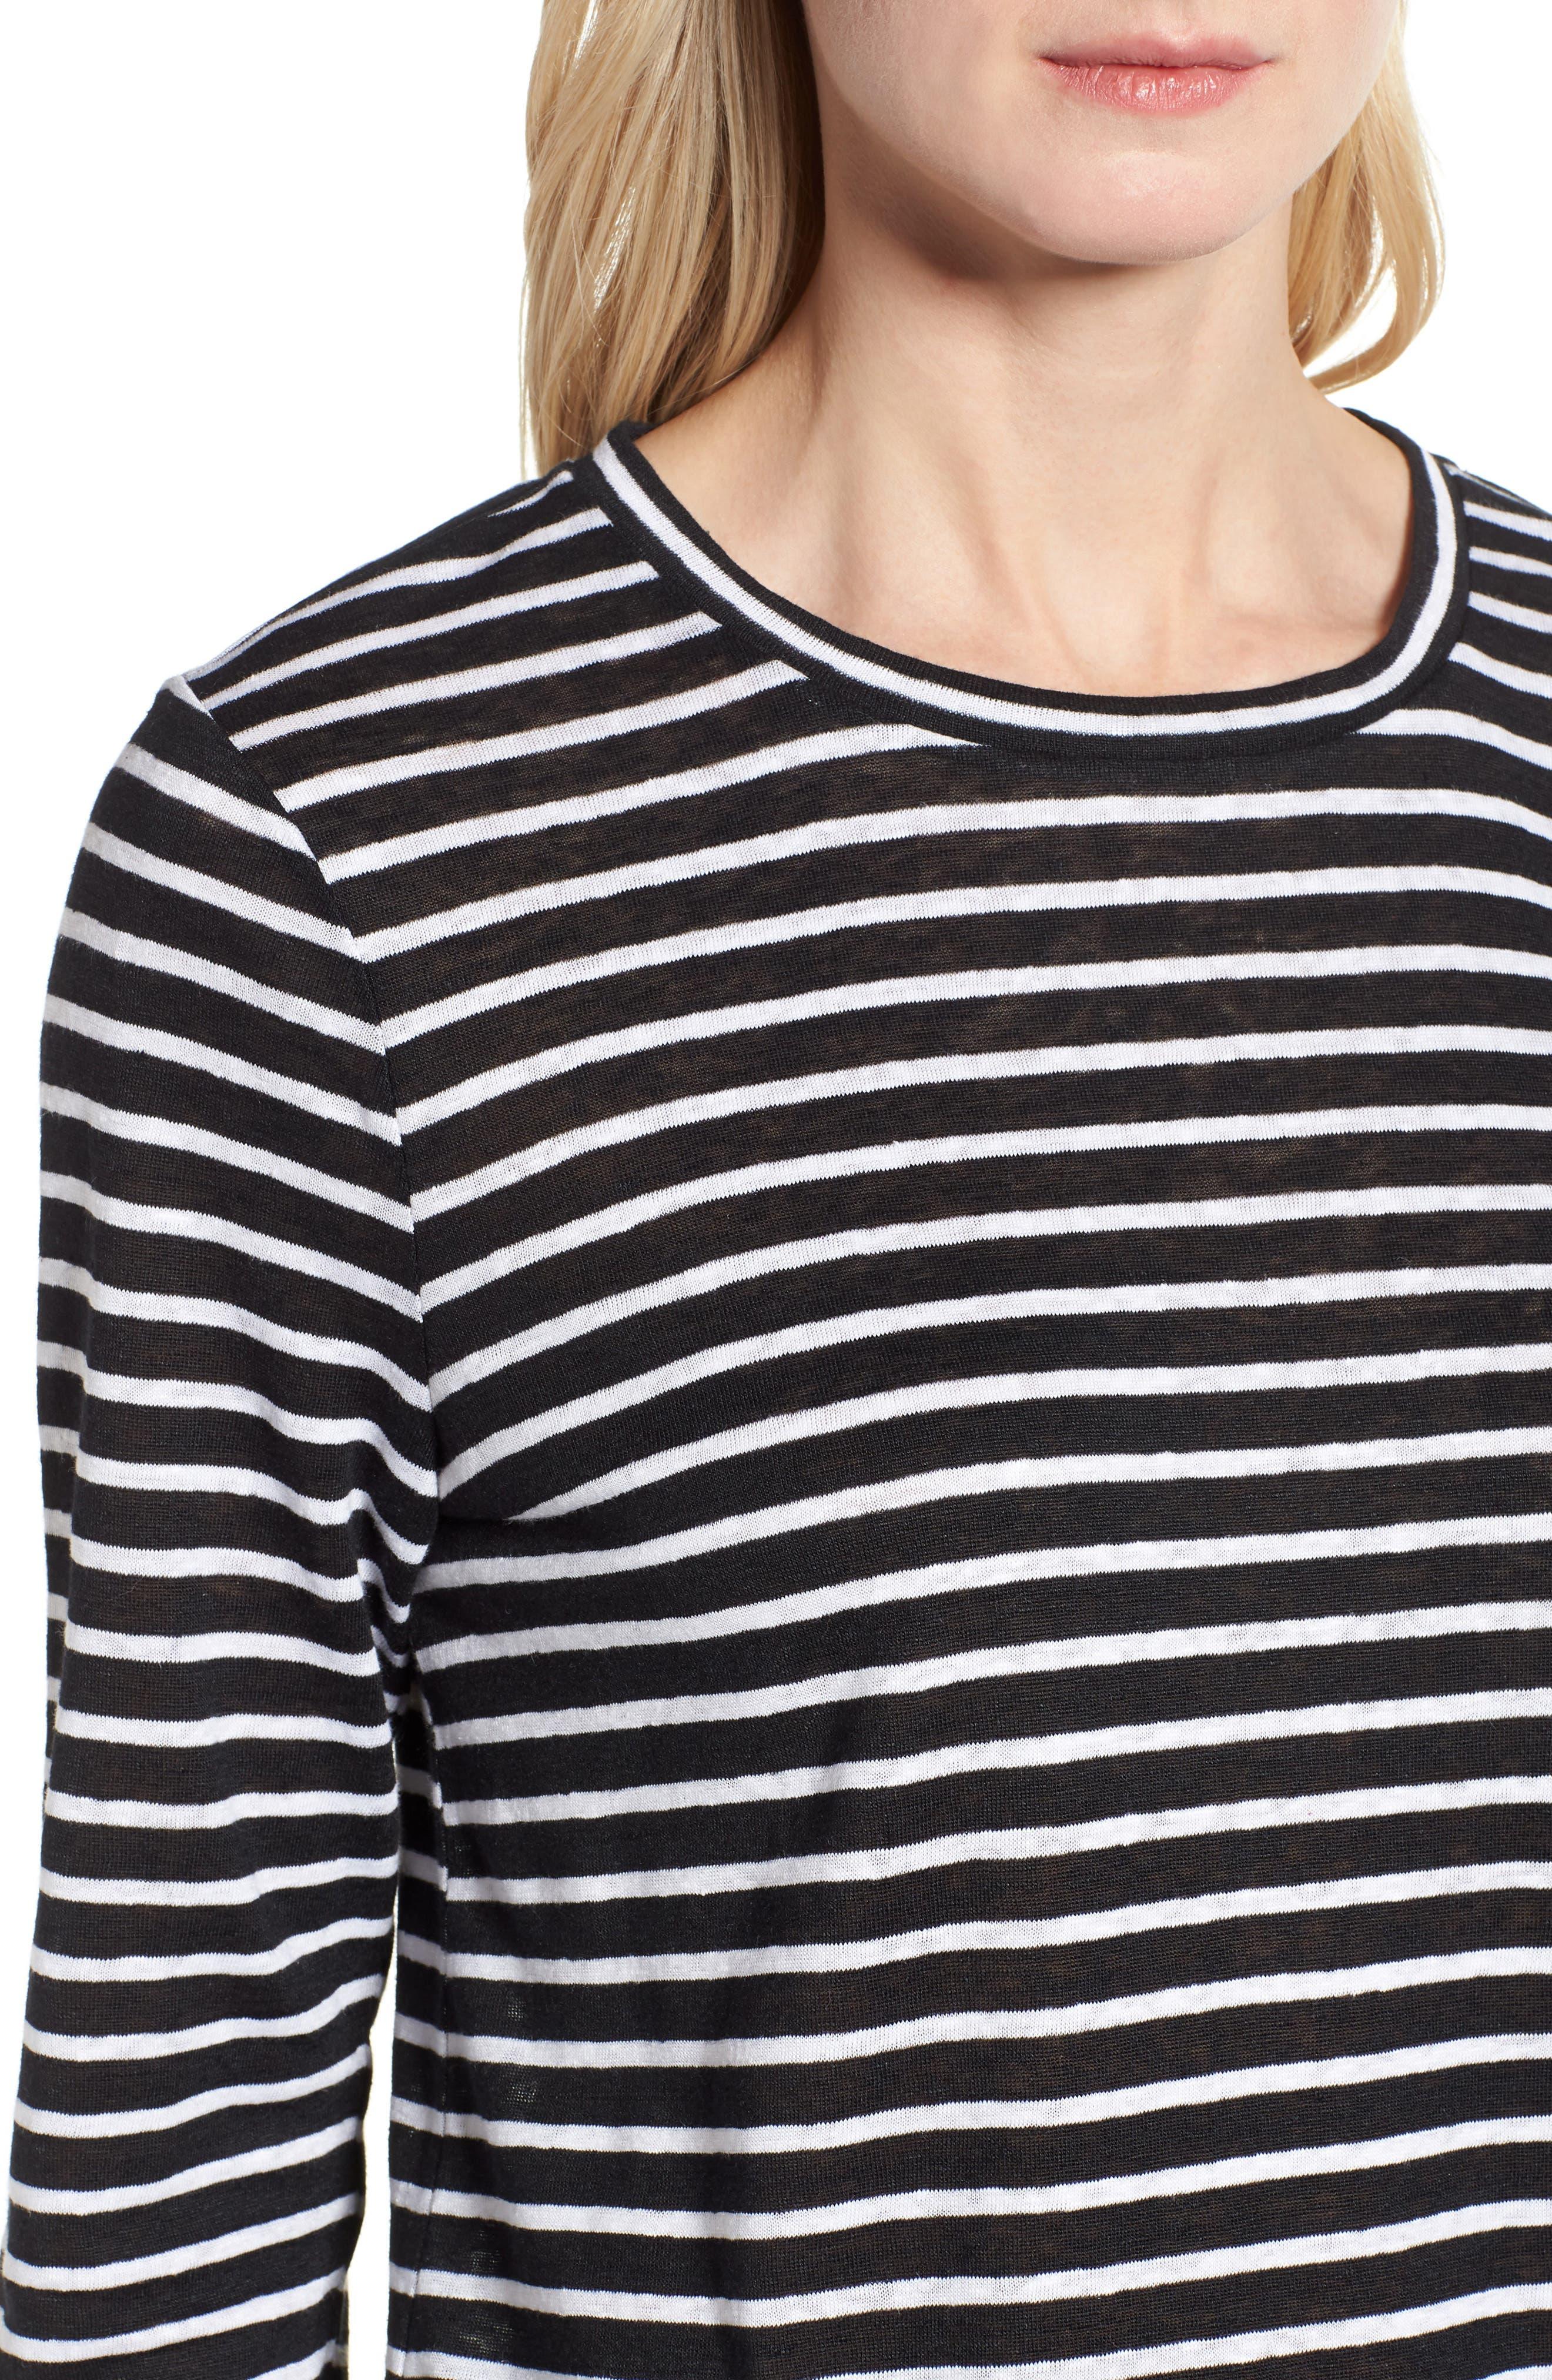 Stripe Organic Linen Top,                             Alternate thumbnail 4, color,                             Black/ White